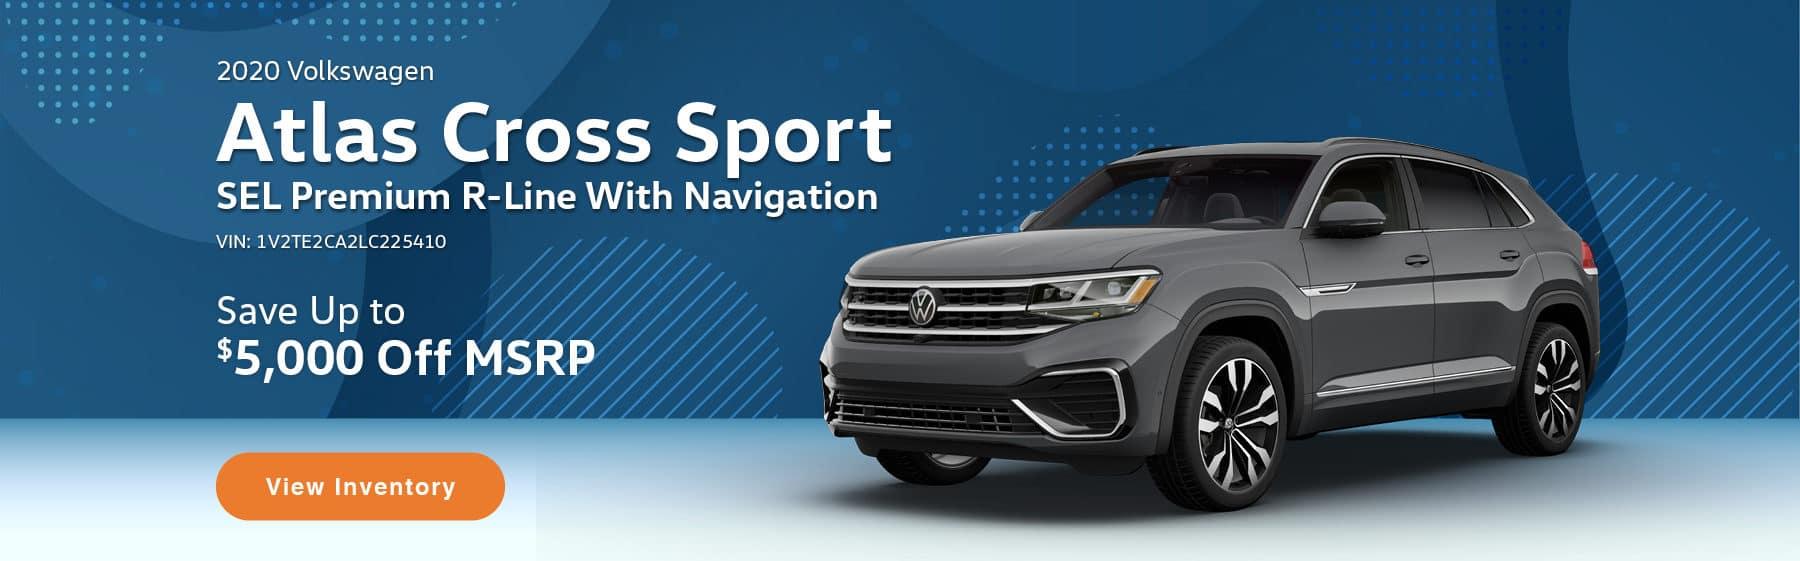 Save up to $5,000 off MSRP on the 2020 Atlas Cross Sport 3.6L V6 SEL Premium R-Line. VIN#: 1V2TE2CA2LC225410.